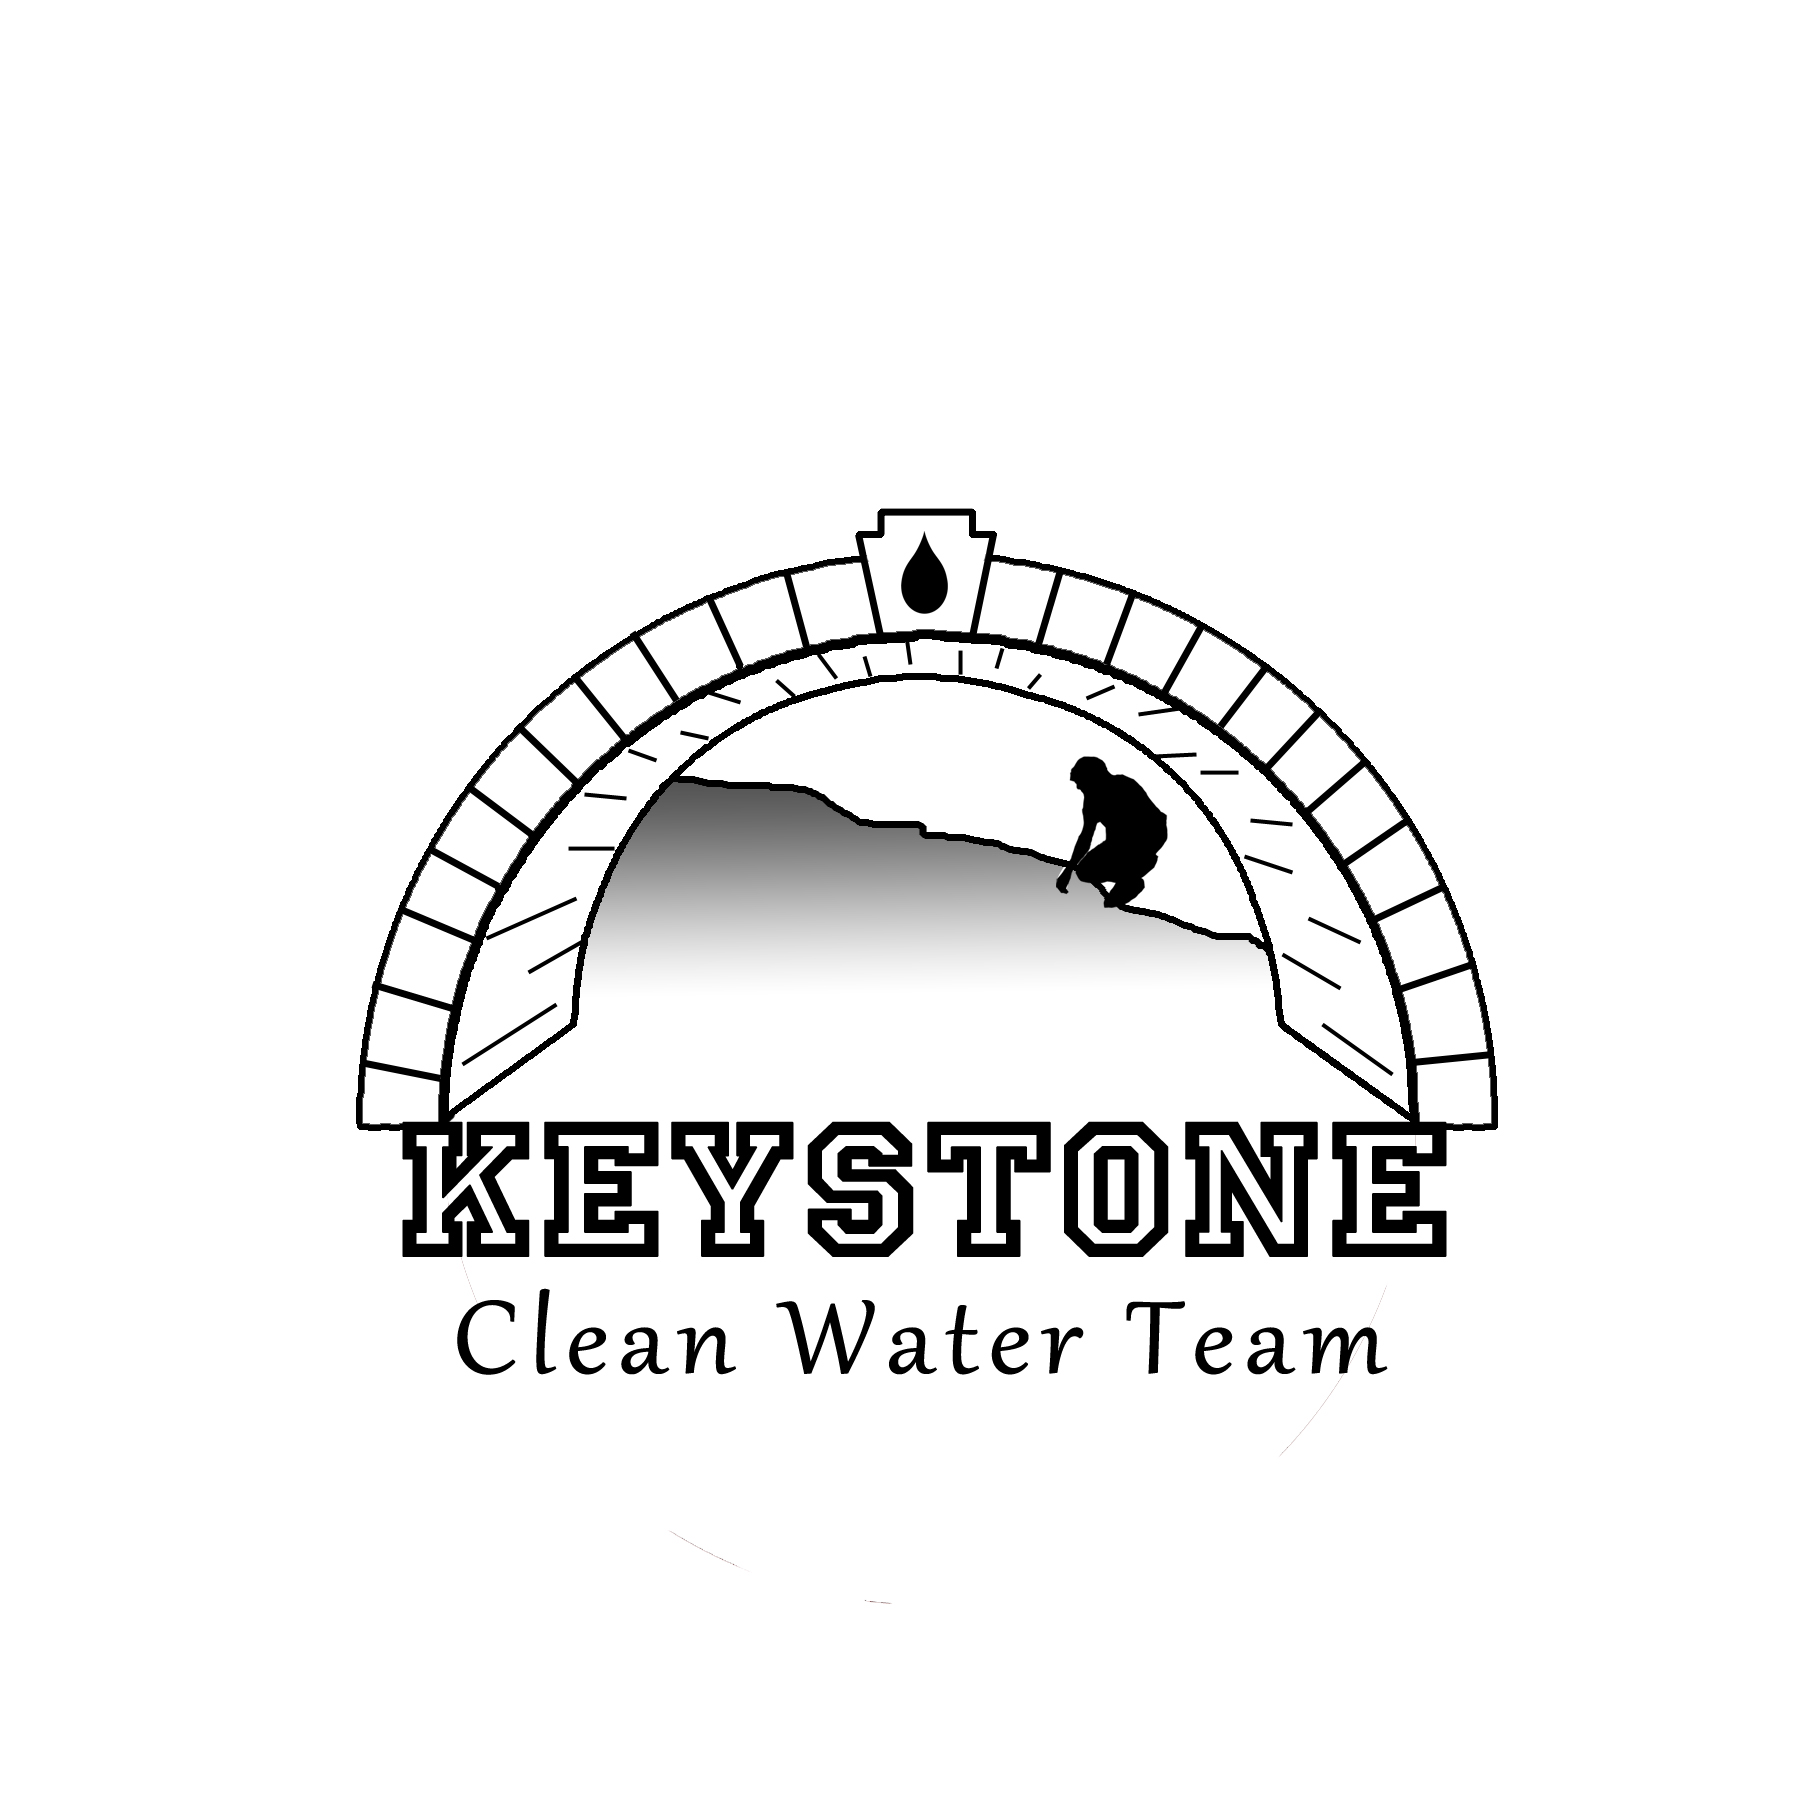 Home Keystone Clean Water Team Ccgg